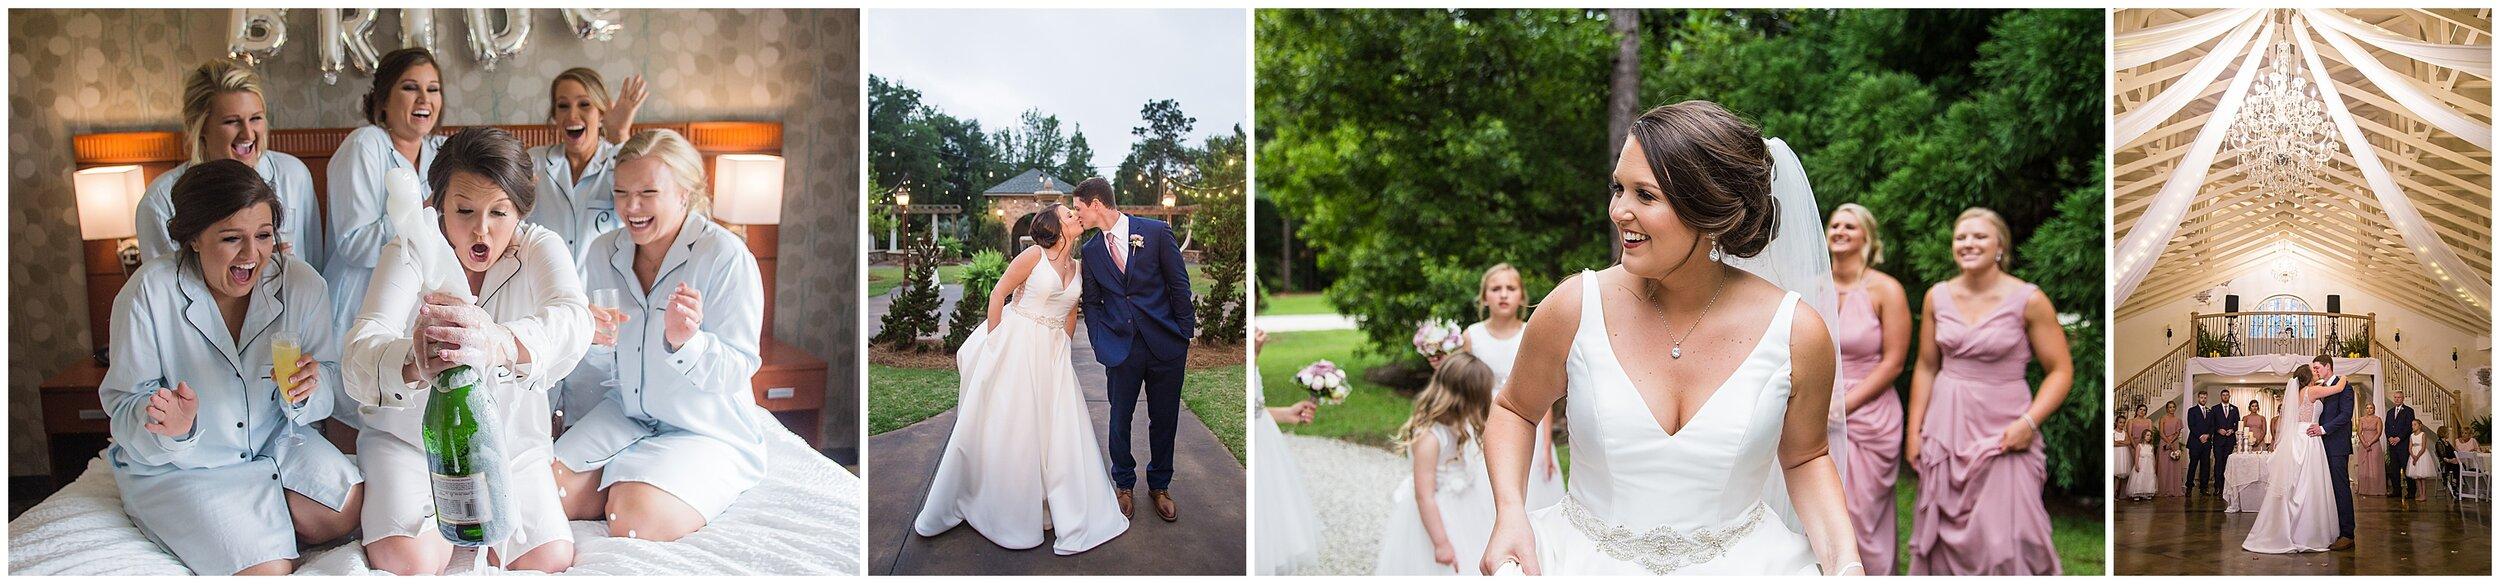 Bella Sera Gardens Alabama Wedding Photographer Videography Briana Zac_0036.jpg